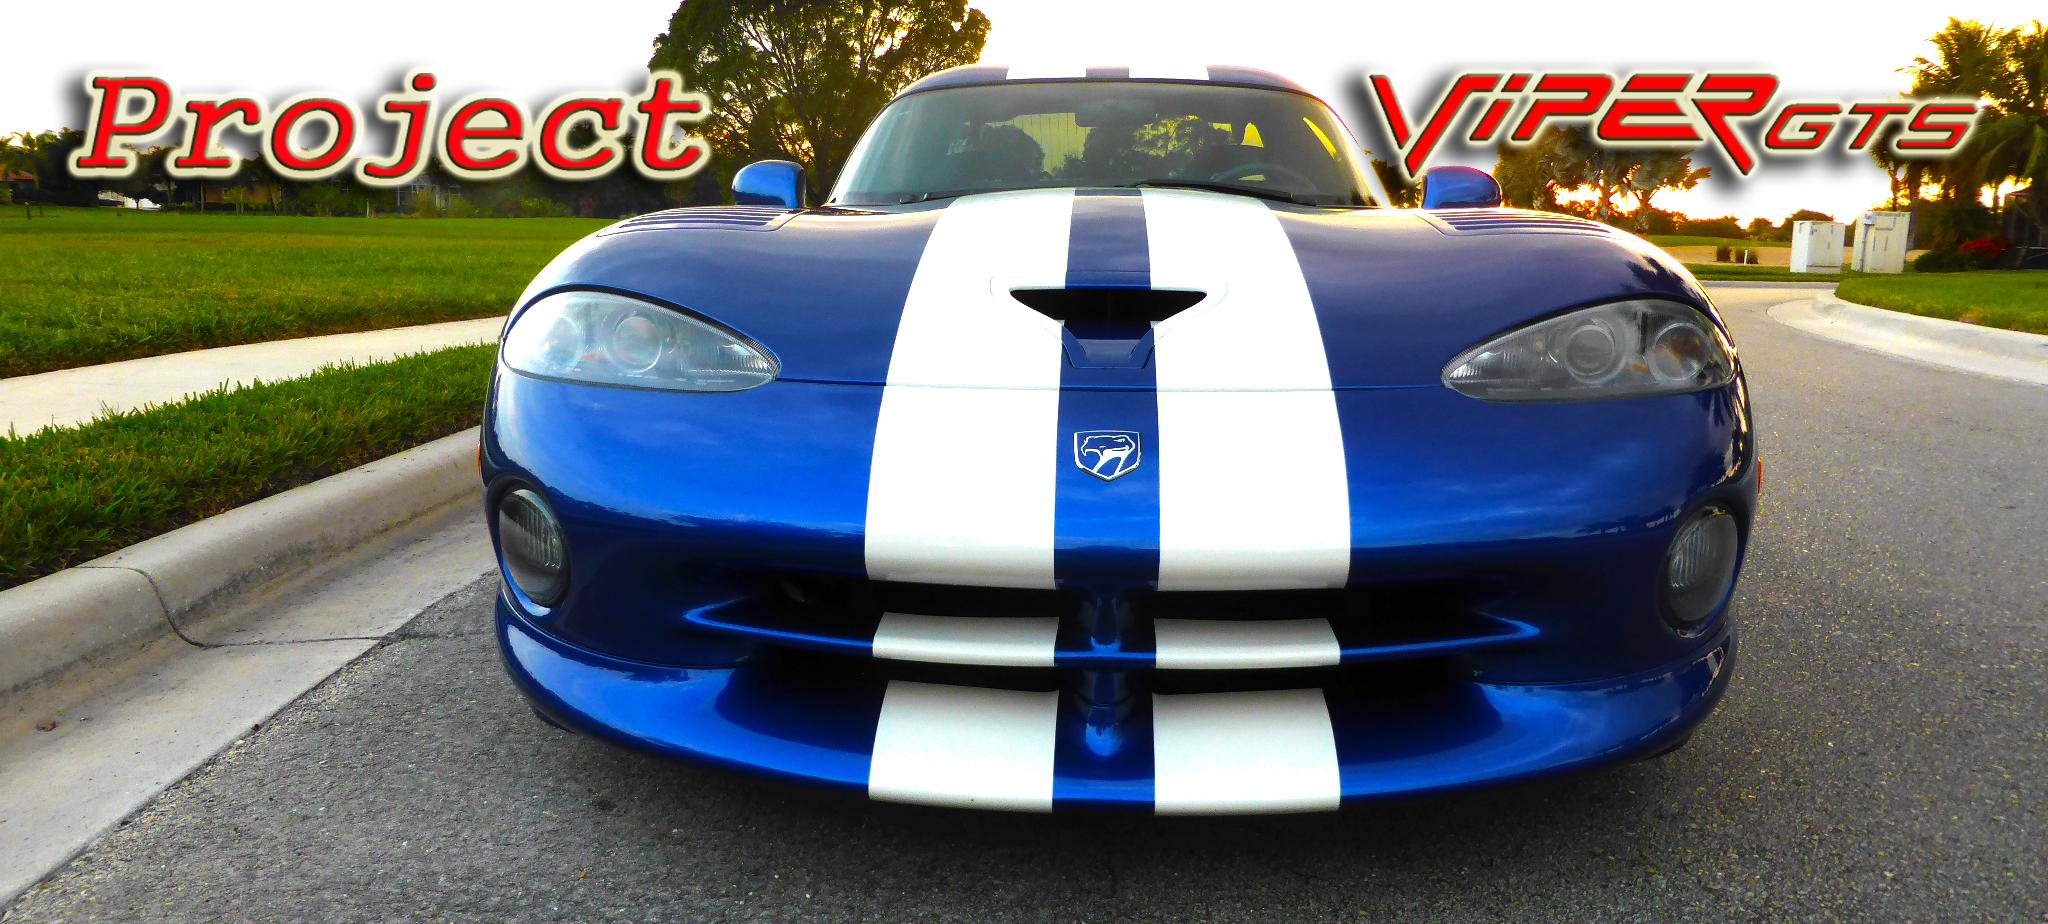 Glorious Viper GTS